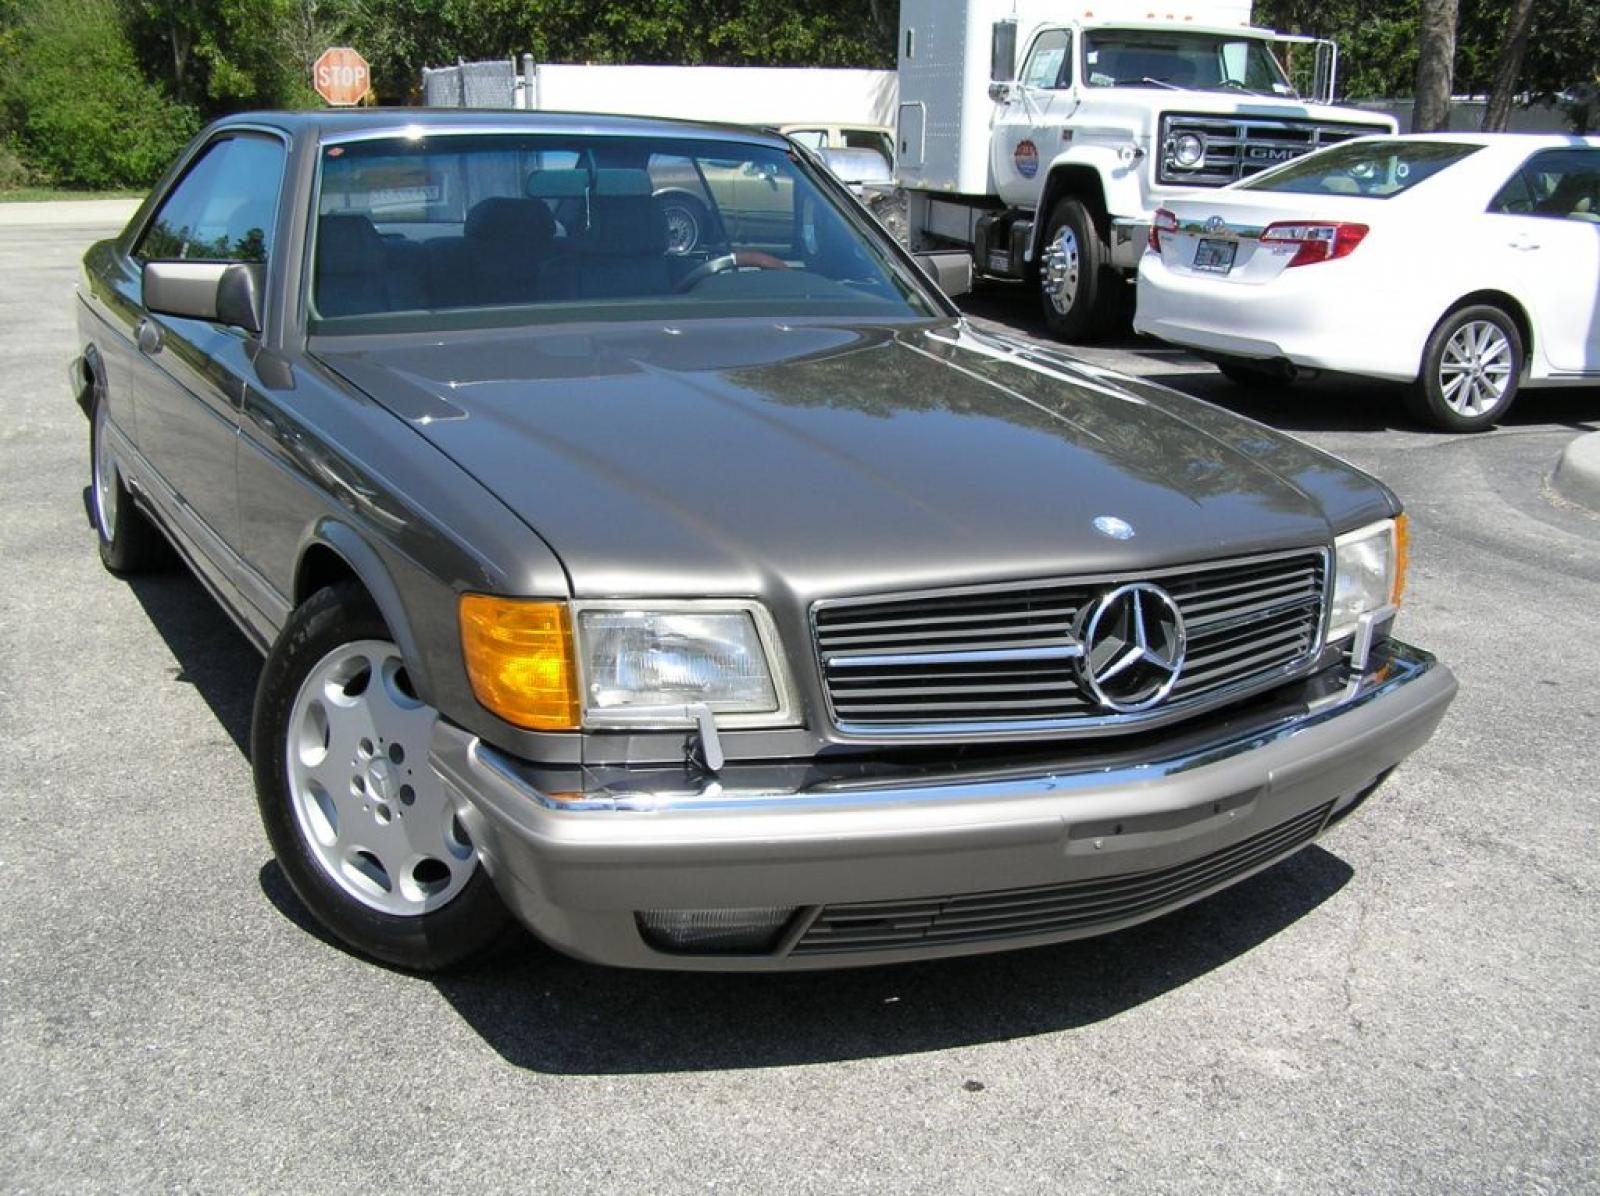 1990 mercedes benz 560 class information and photos for Mercedes benz 560